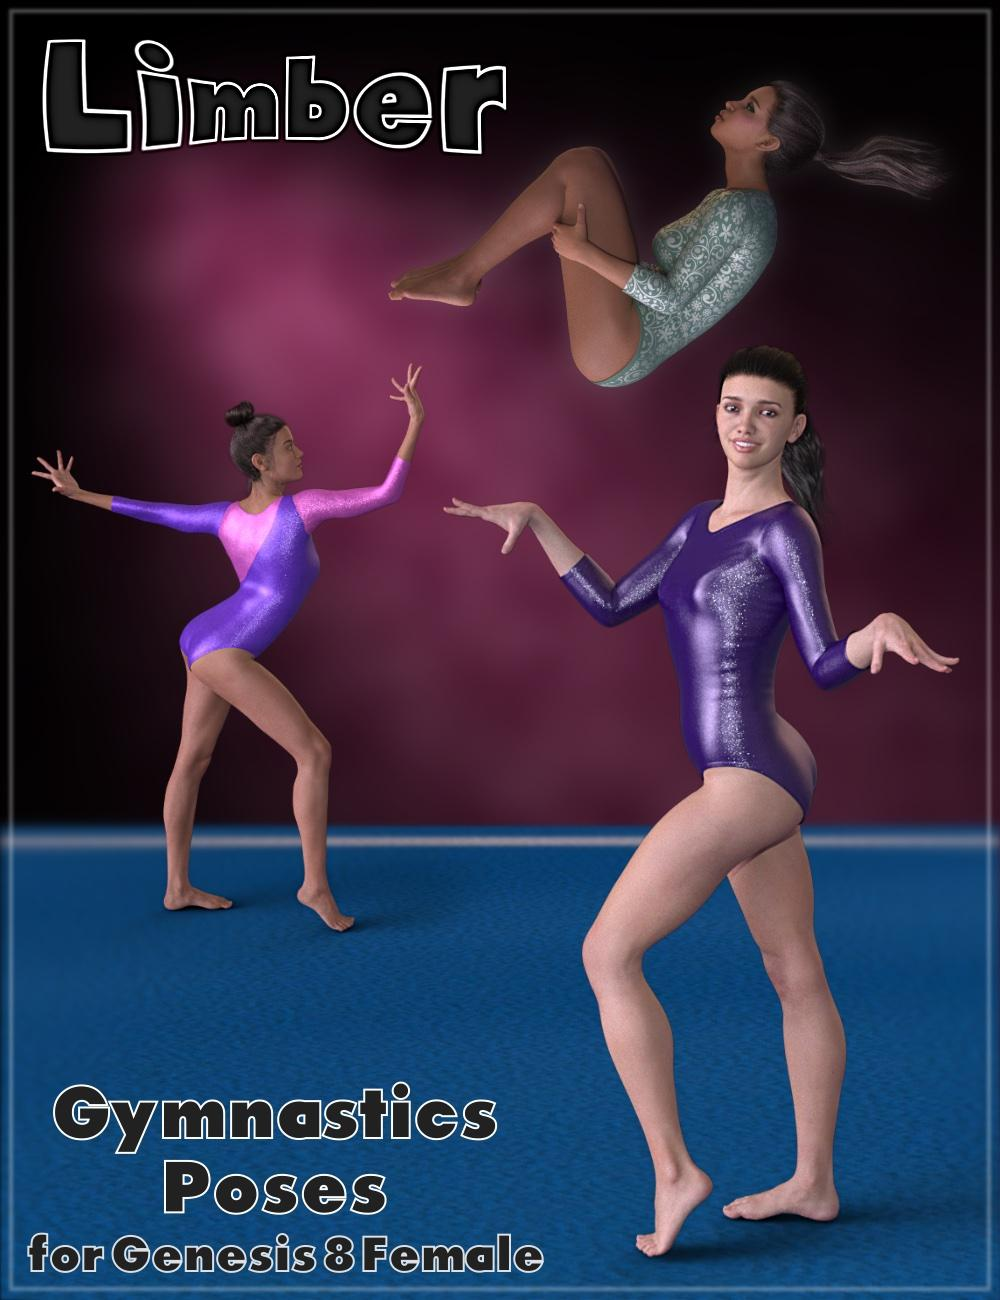 Limber - Gymnastic Poses for Genesis 8 Female